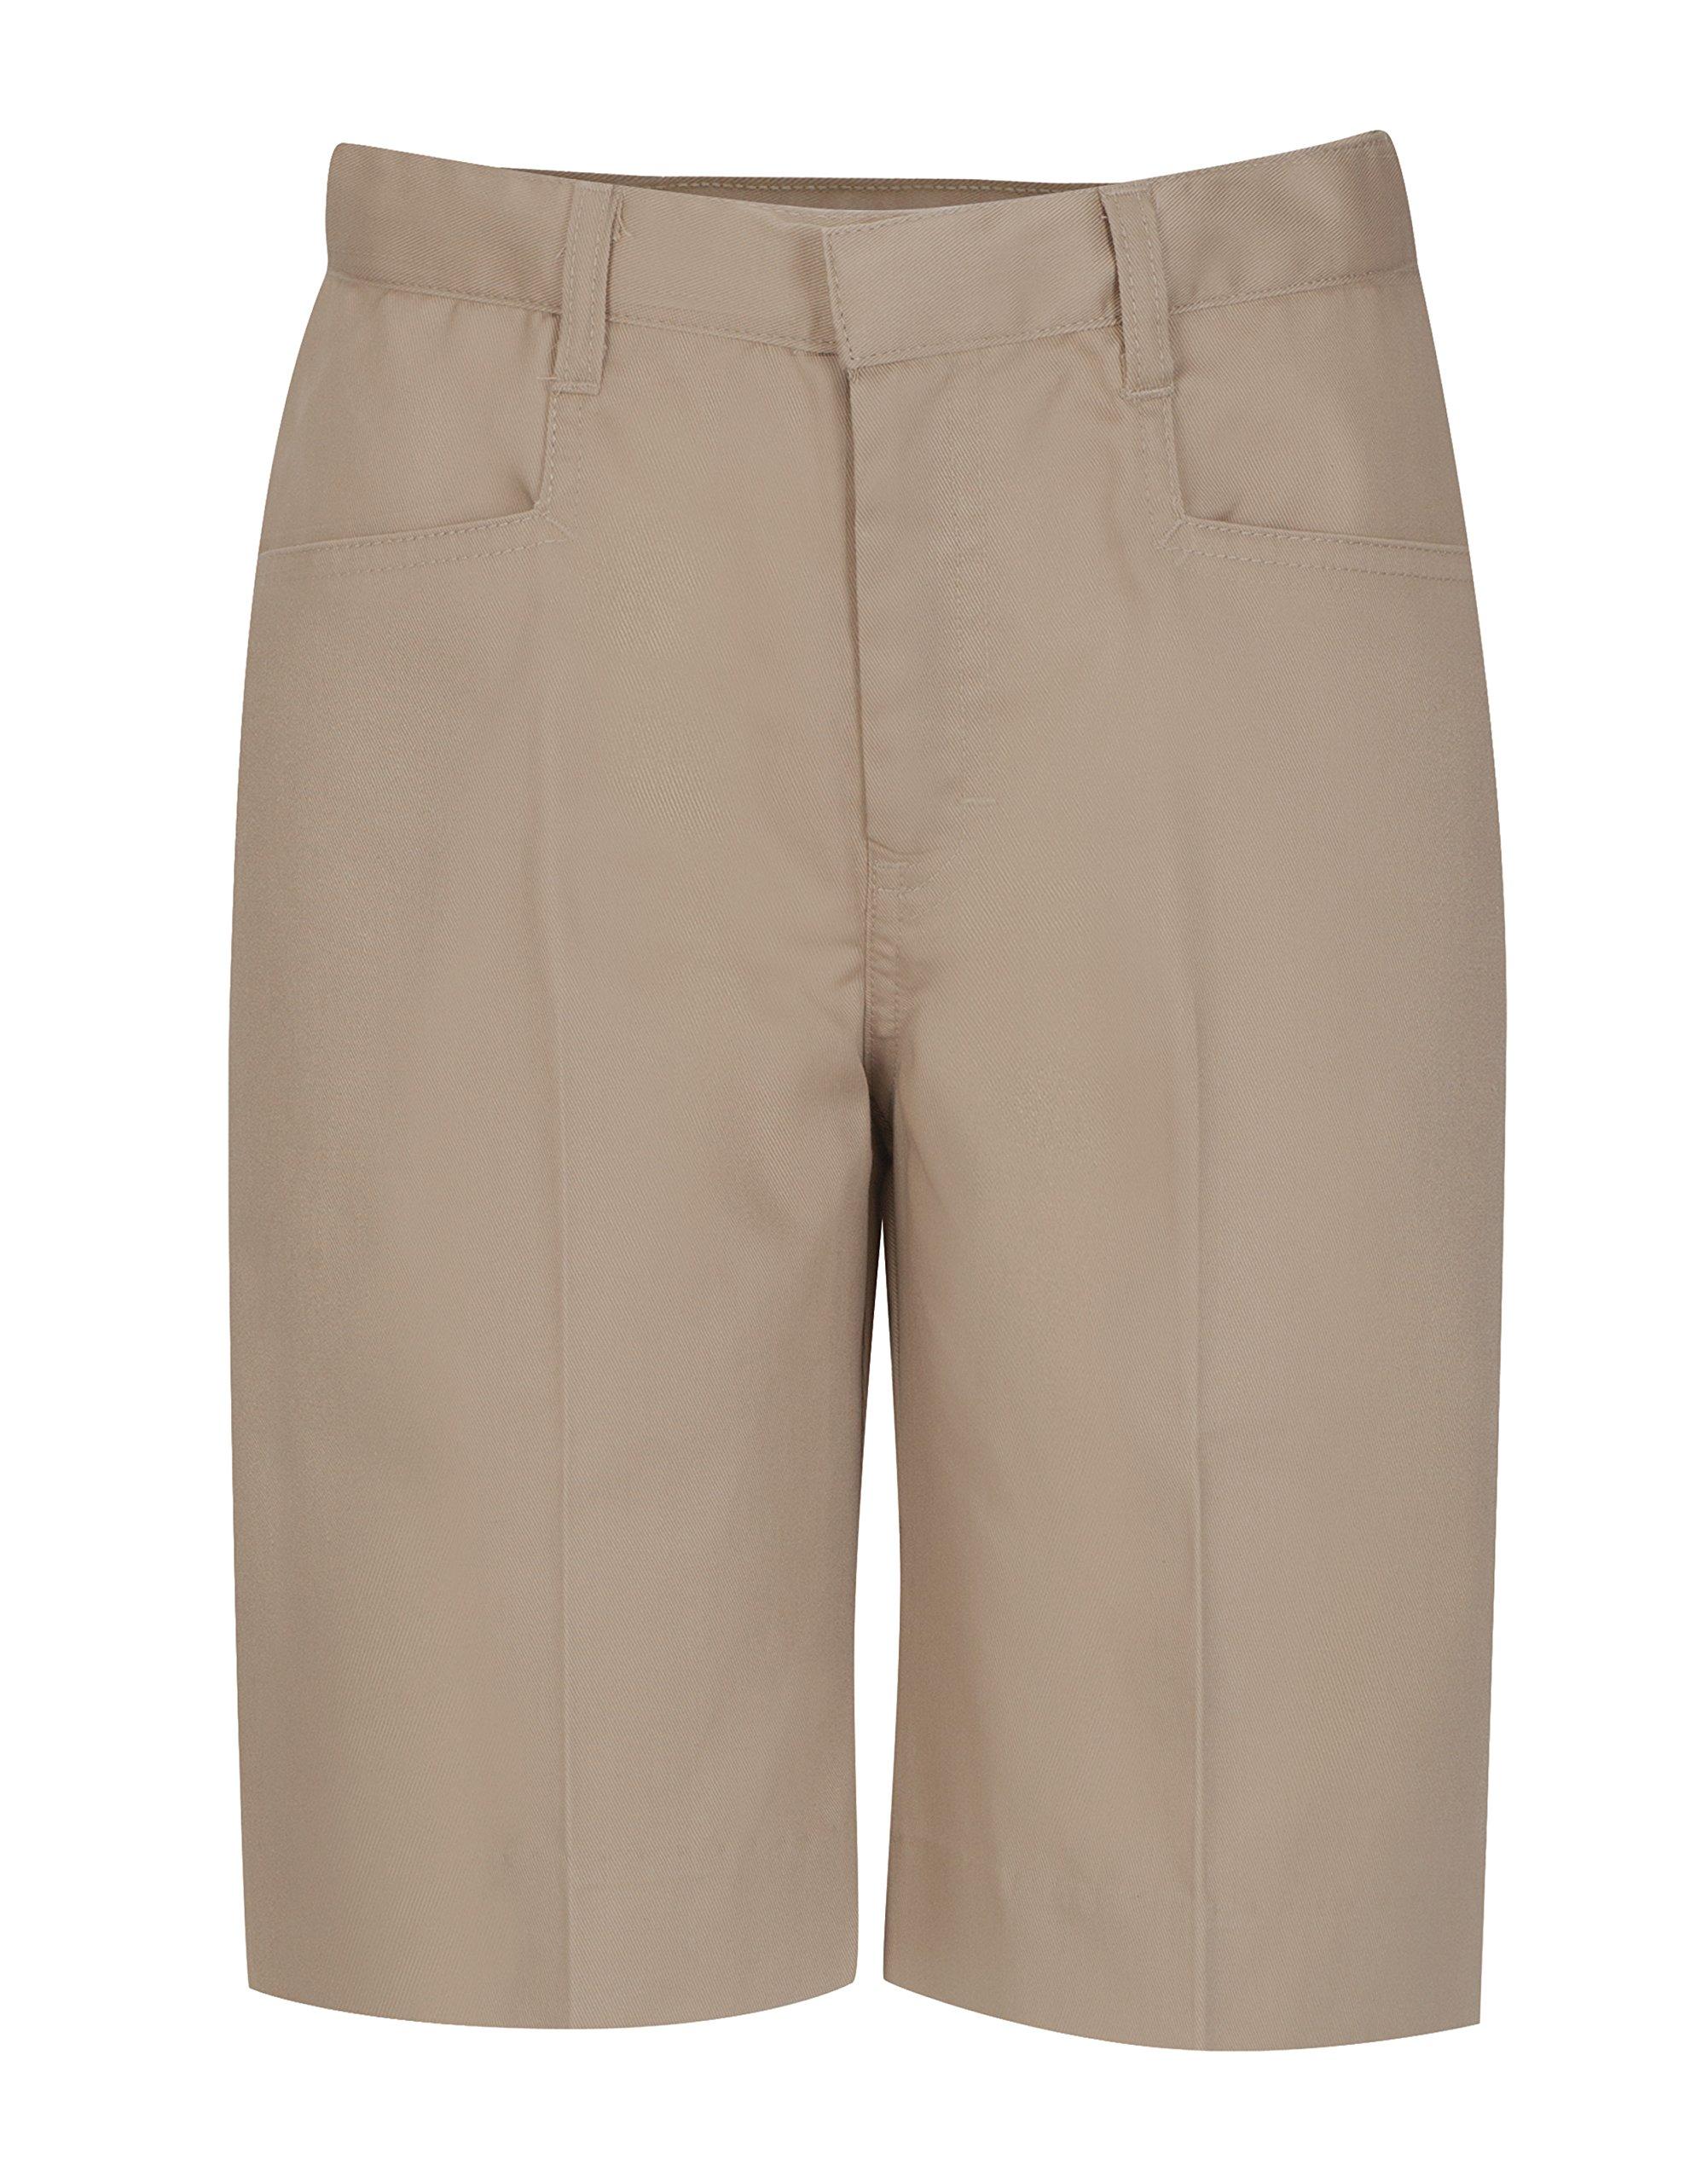 CLASSROOM Big Girls'  Low Rise Bermuda Short Half Size,Khaki,8.5